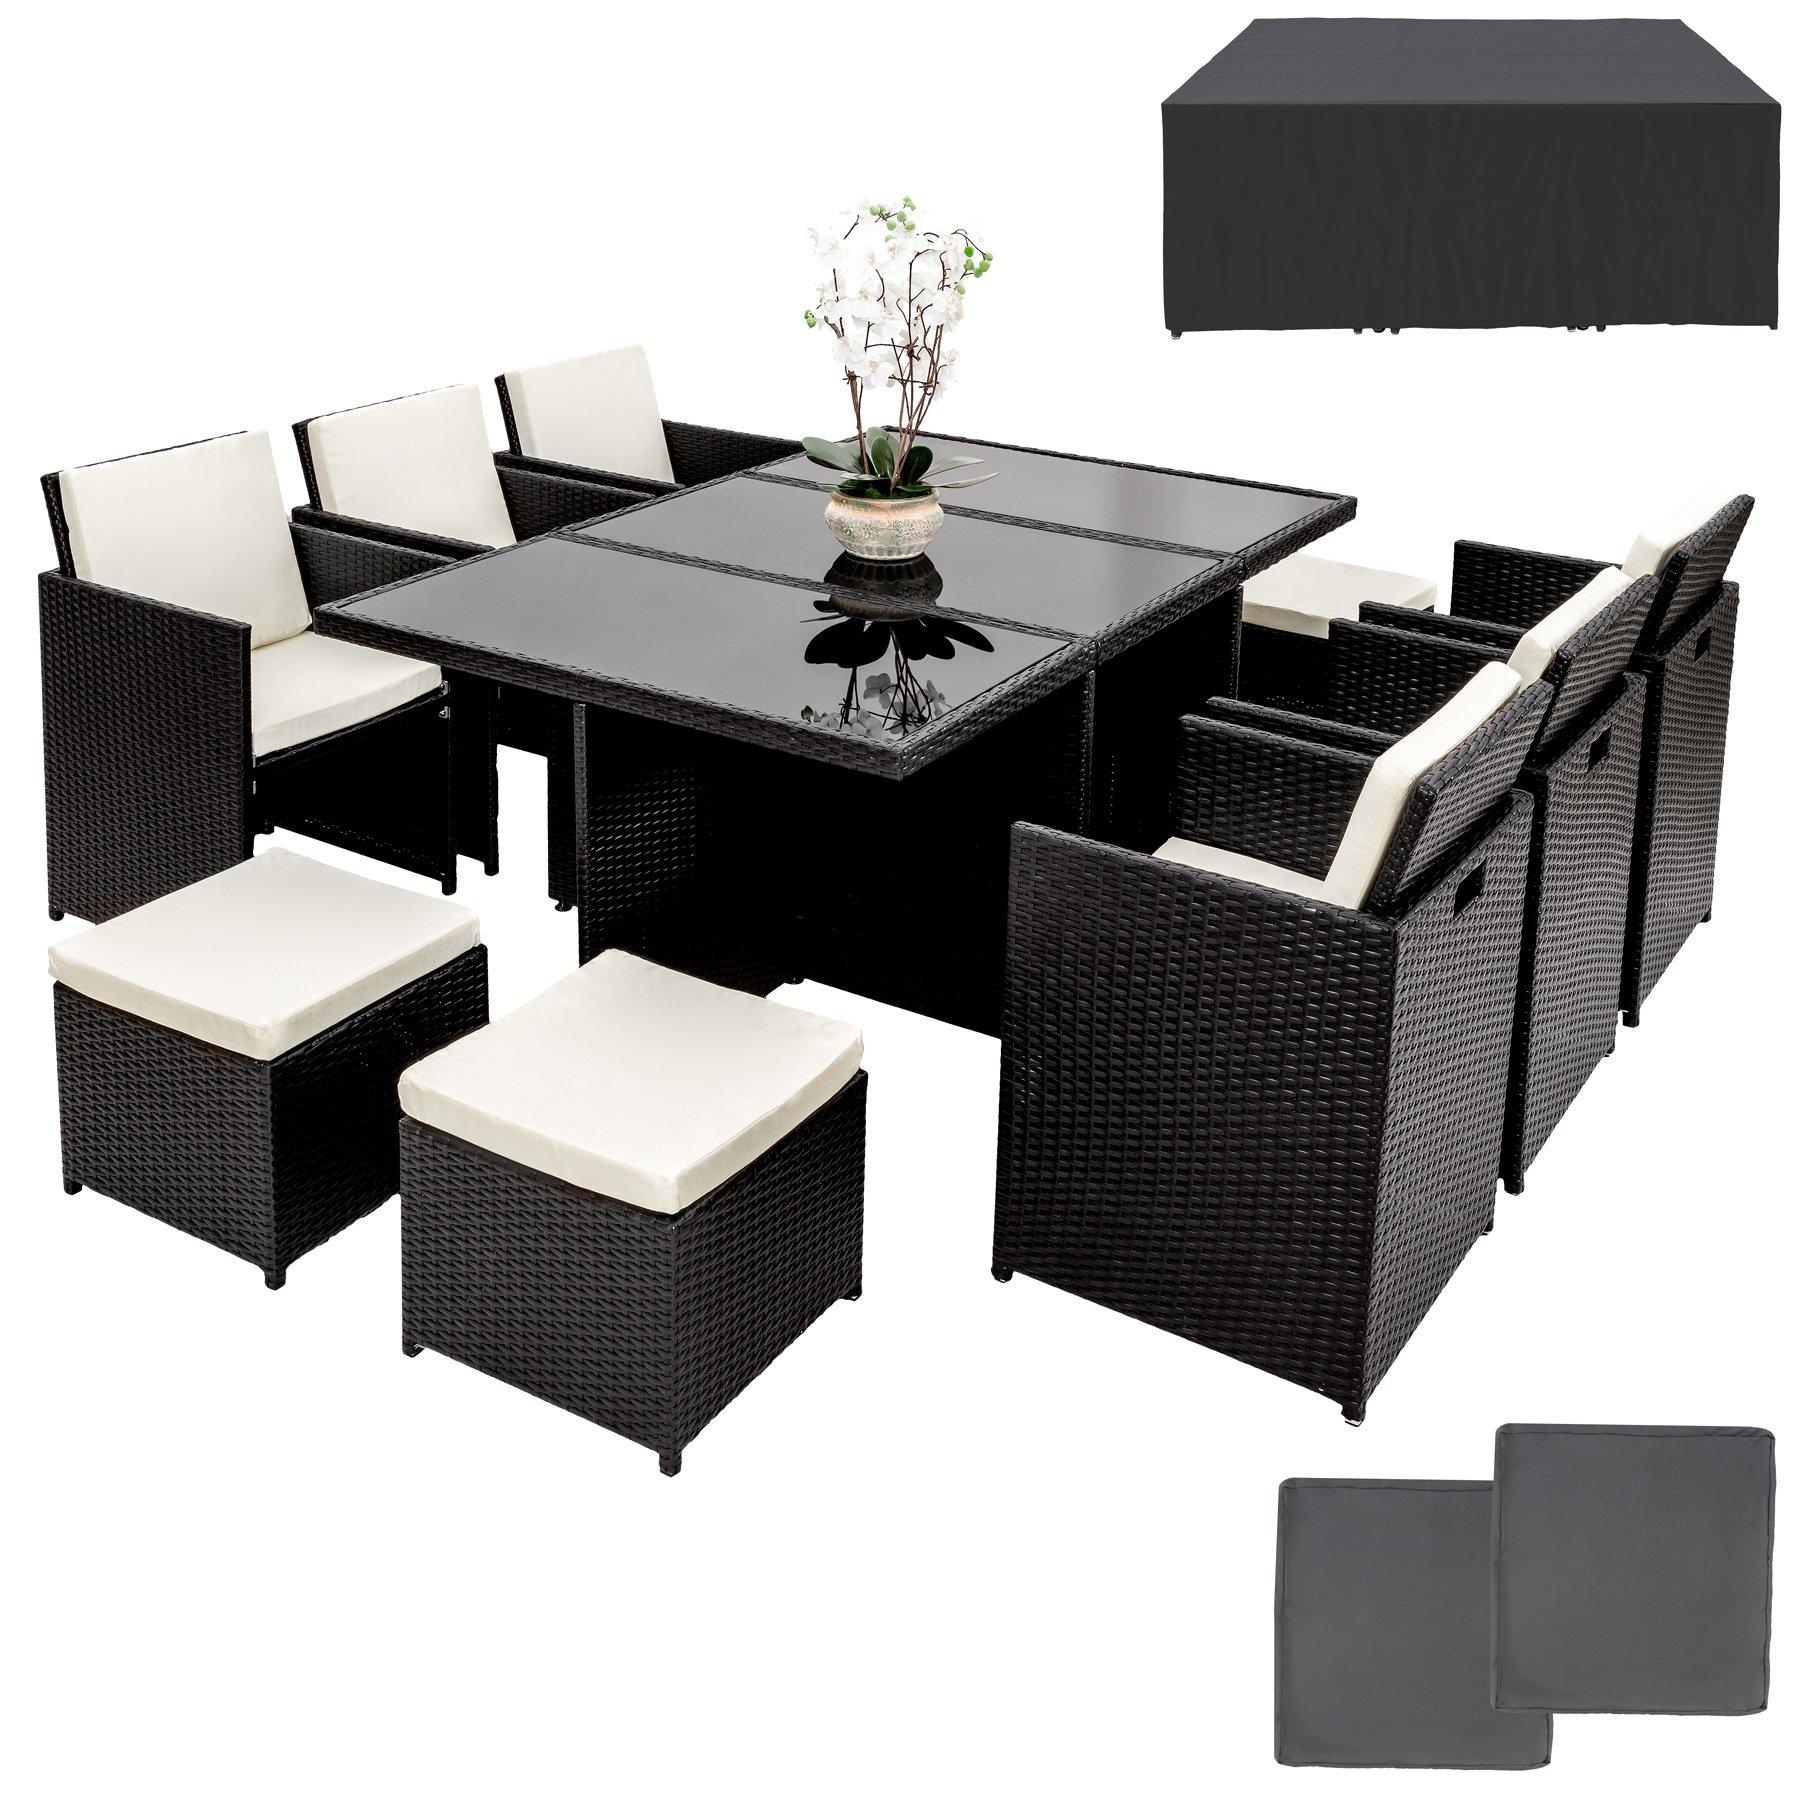 top salons de jardin selon les notes. Black Bedroom Furniture Sets. Home Design Ideas